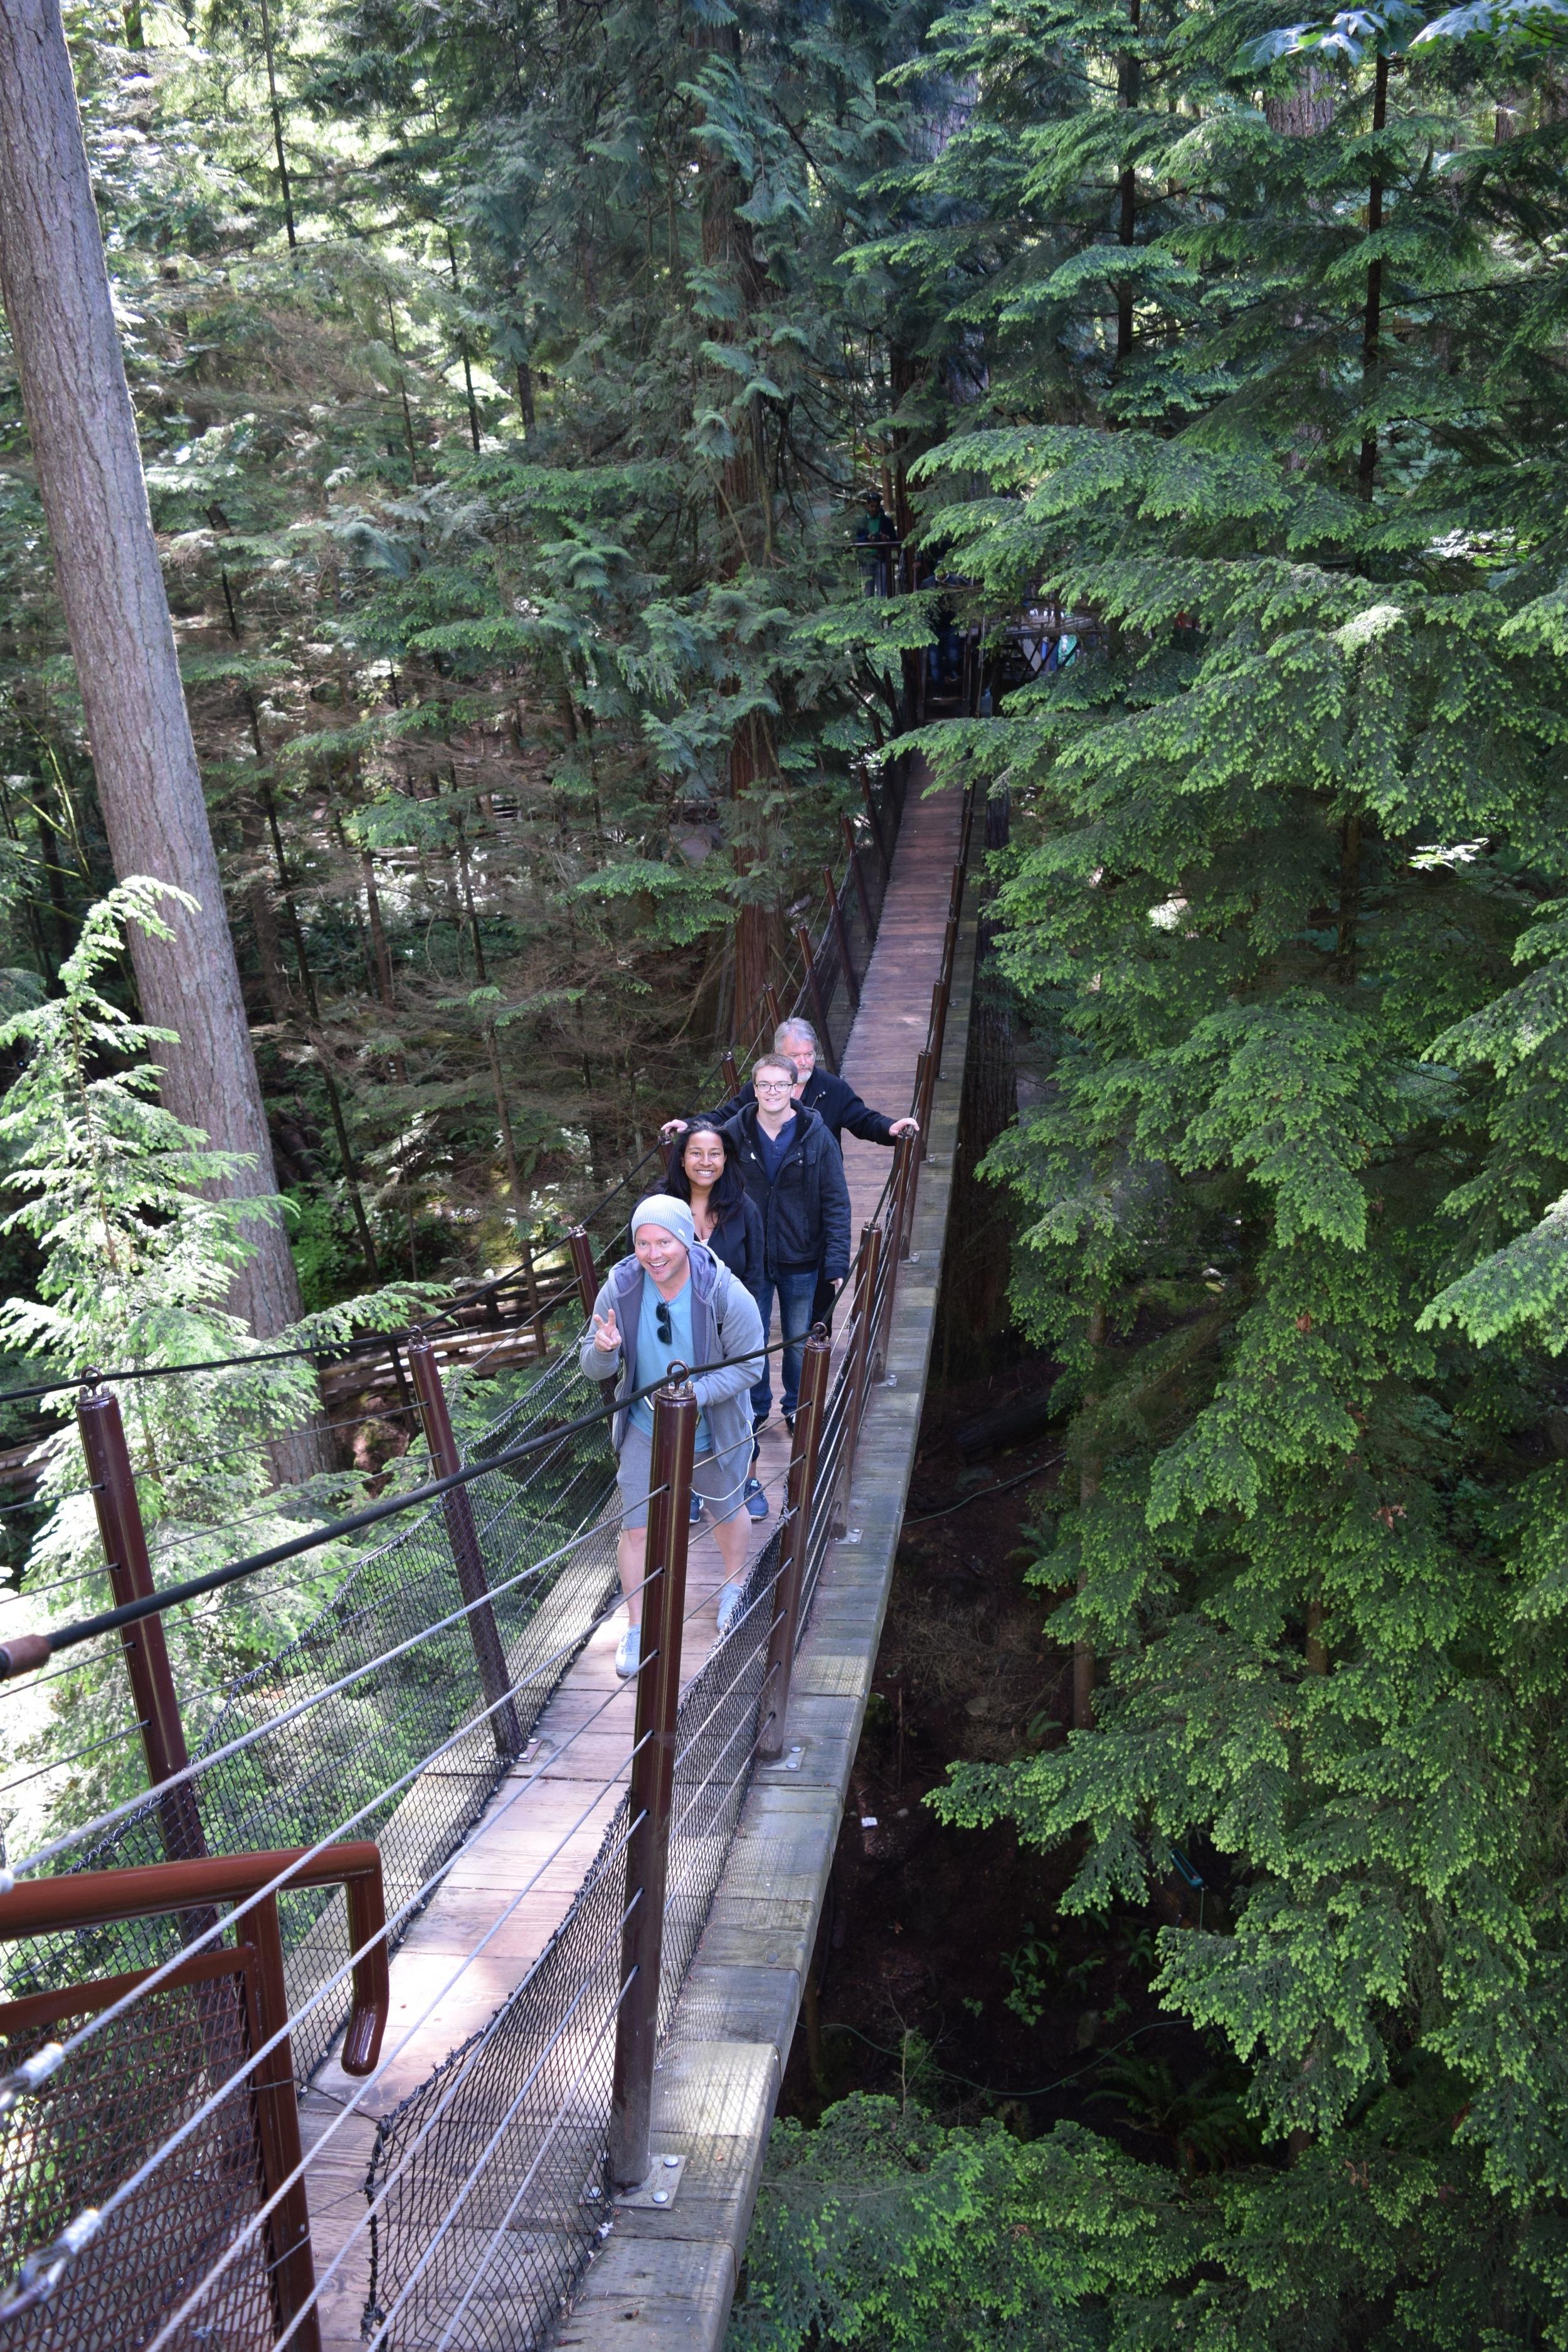 Capilano Suspension Bridge Tree Walkway 2.jpg